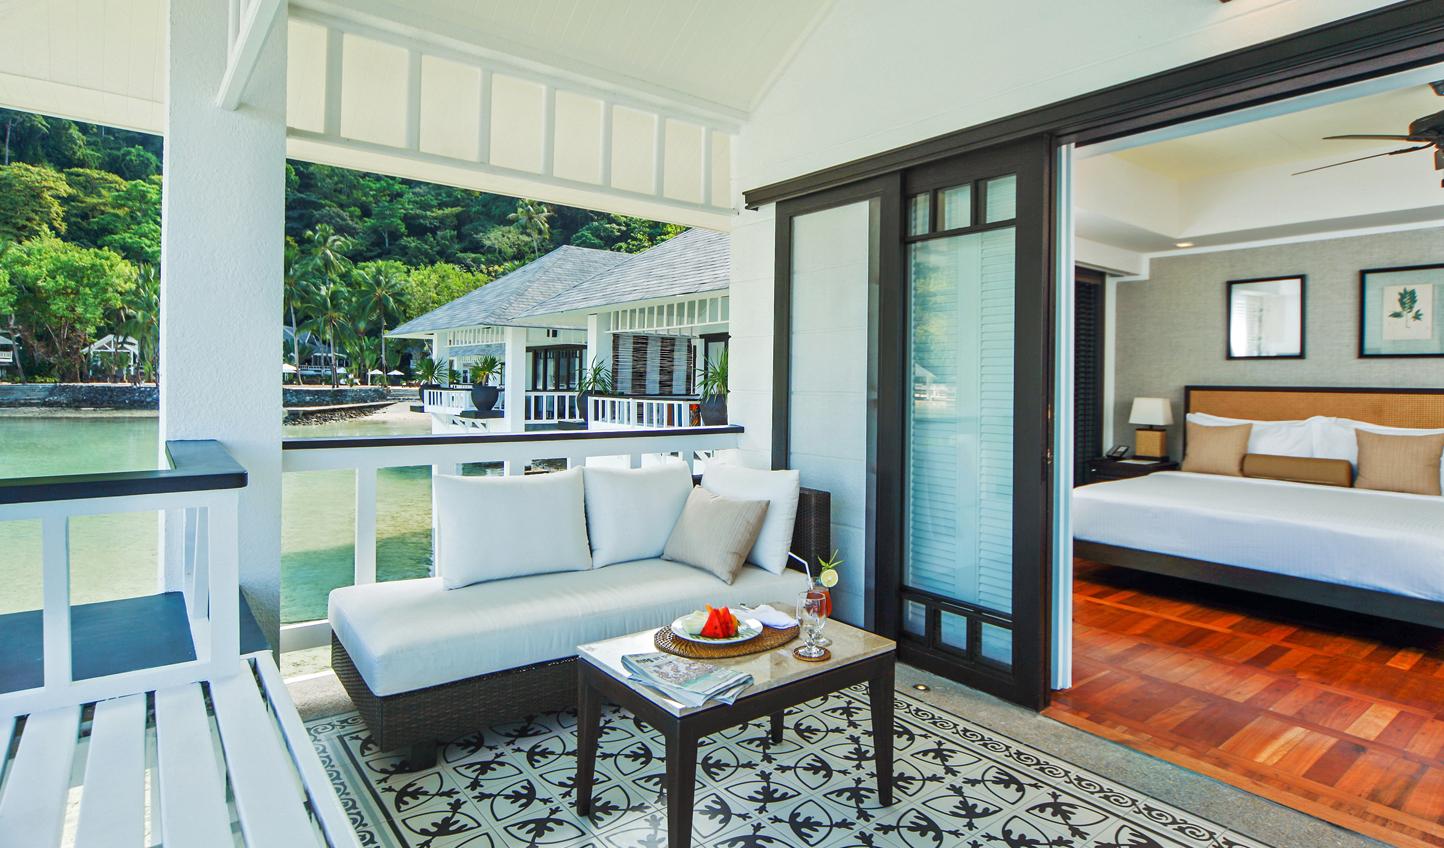 Each bungalow has its own terrace